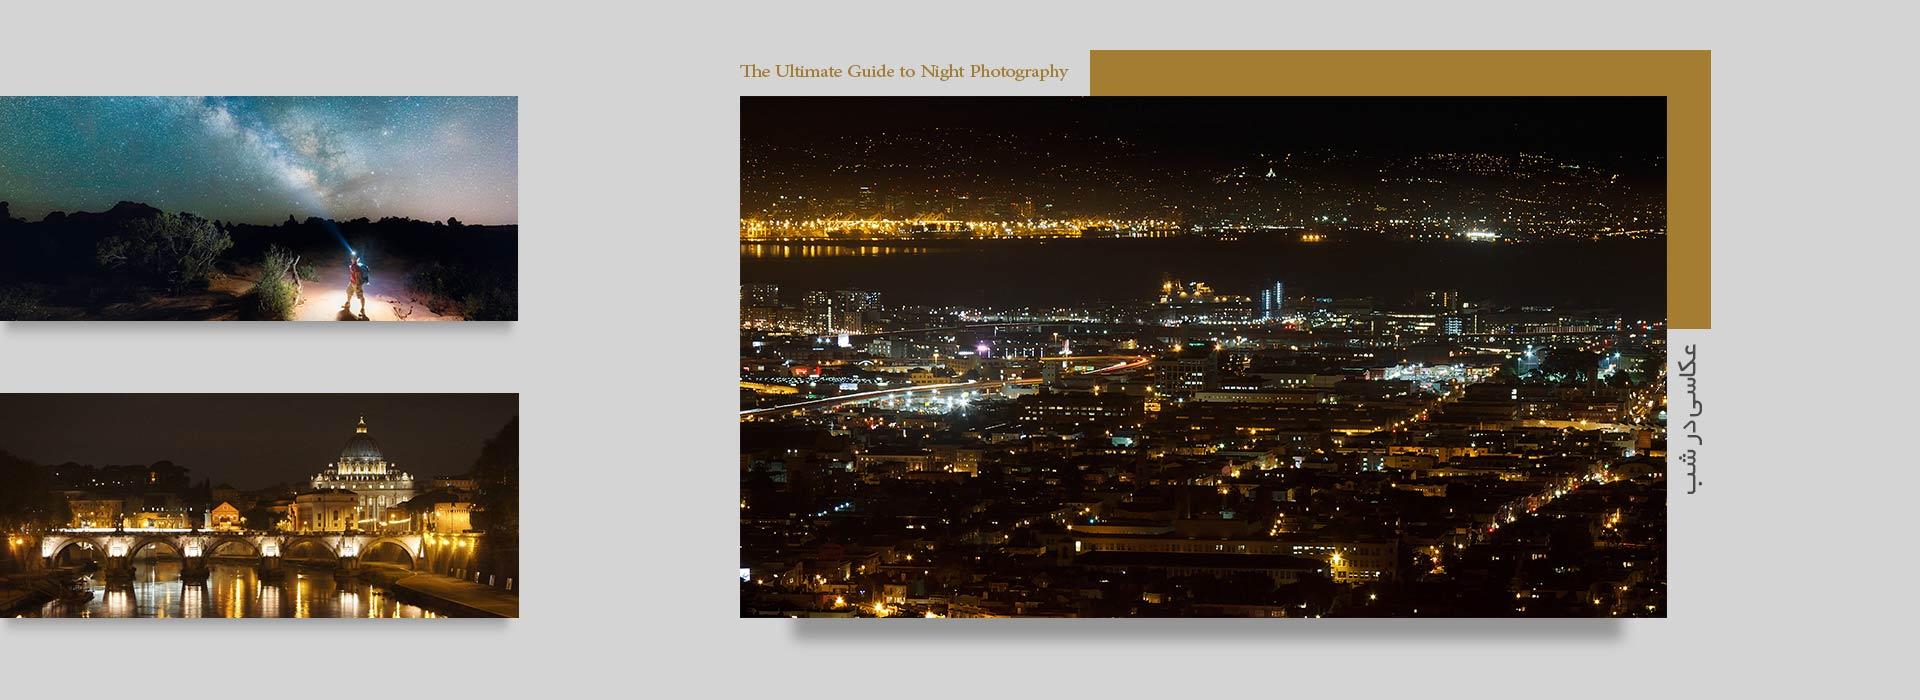 night photography - عکاسی در شب